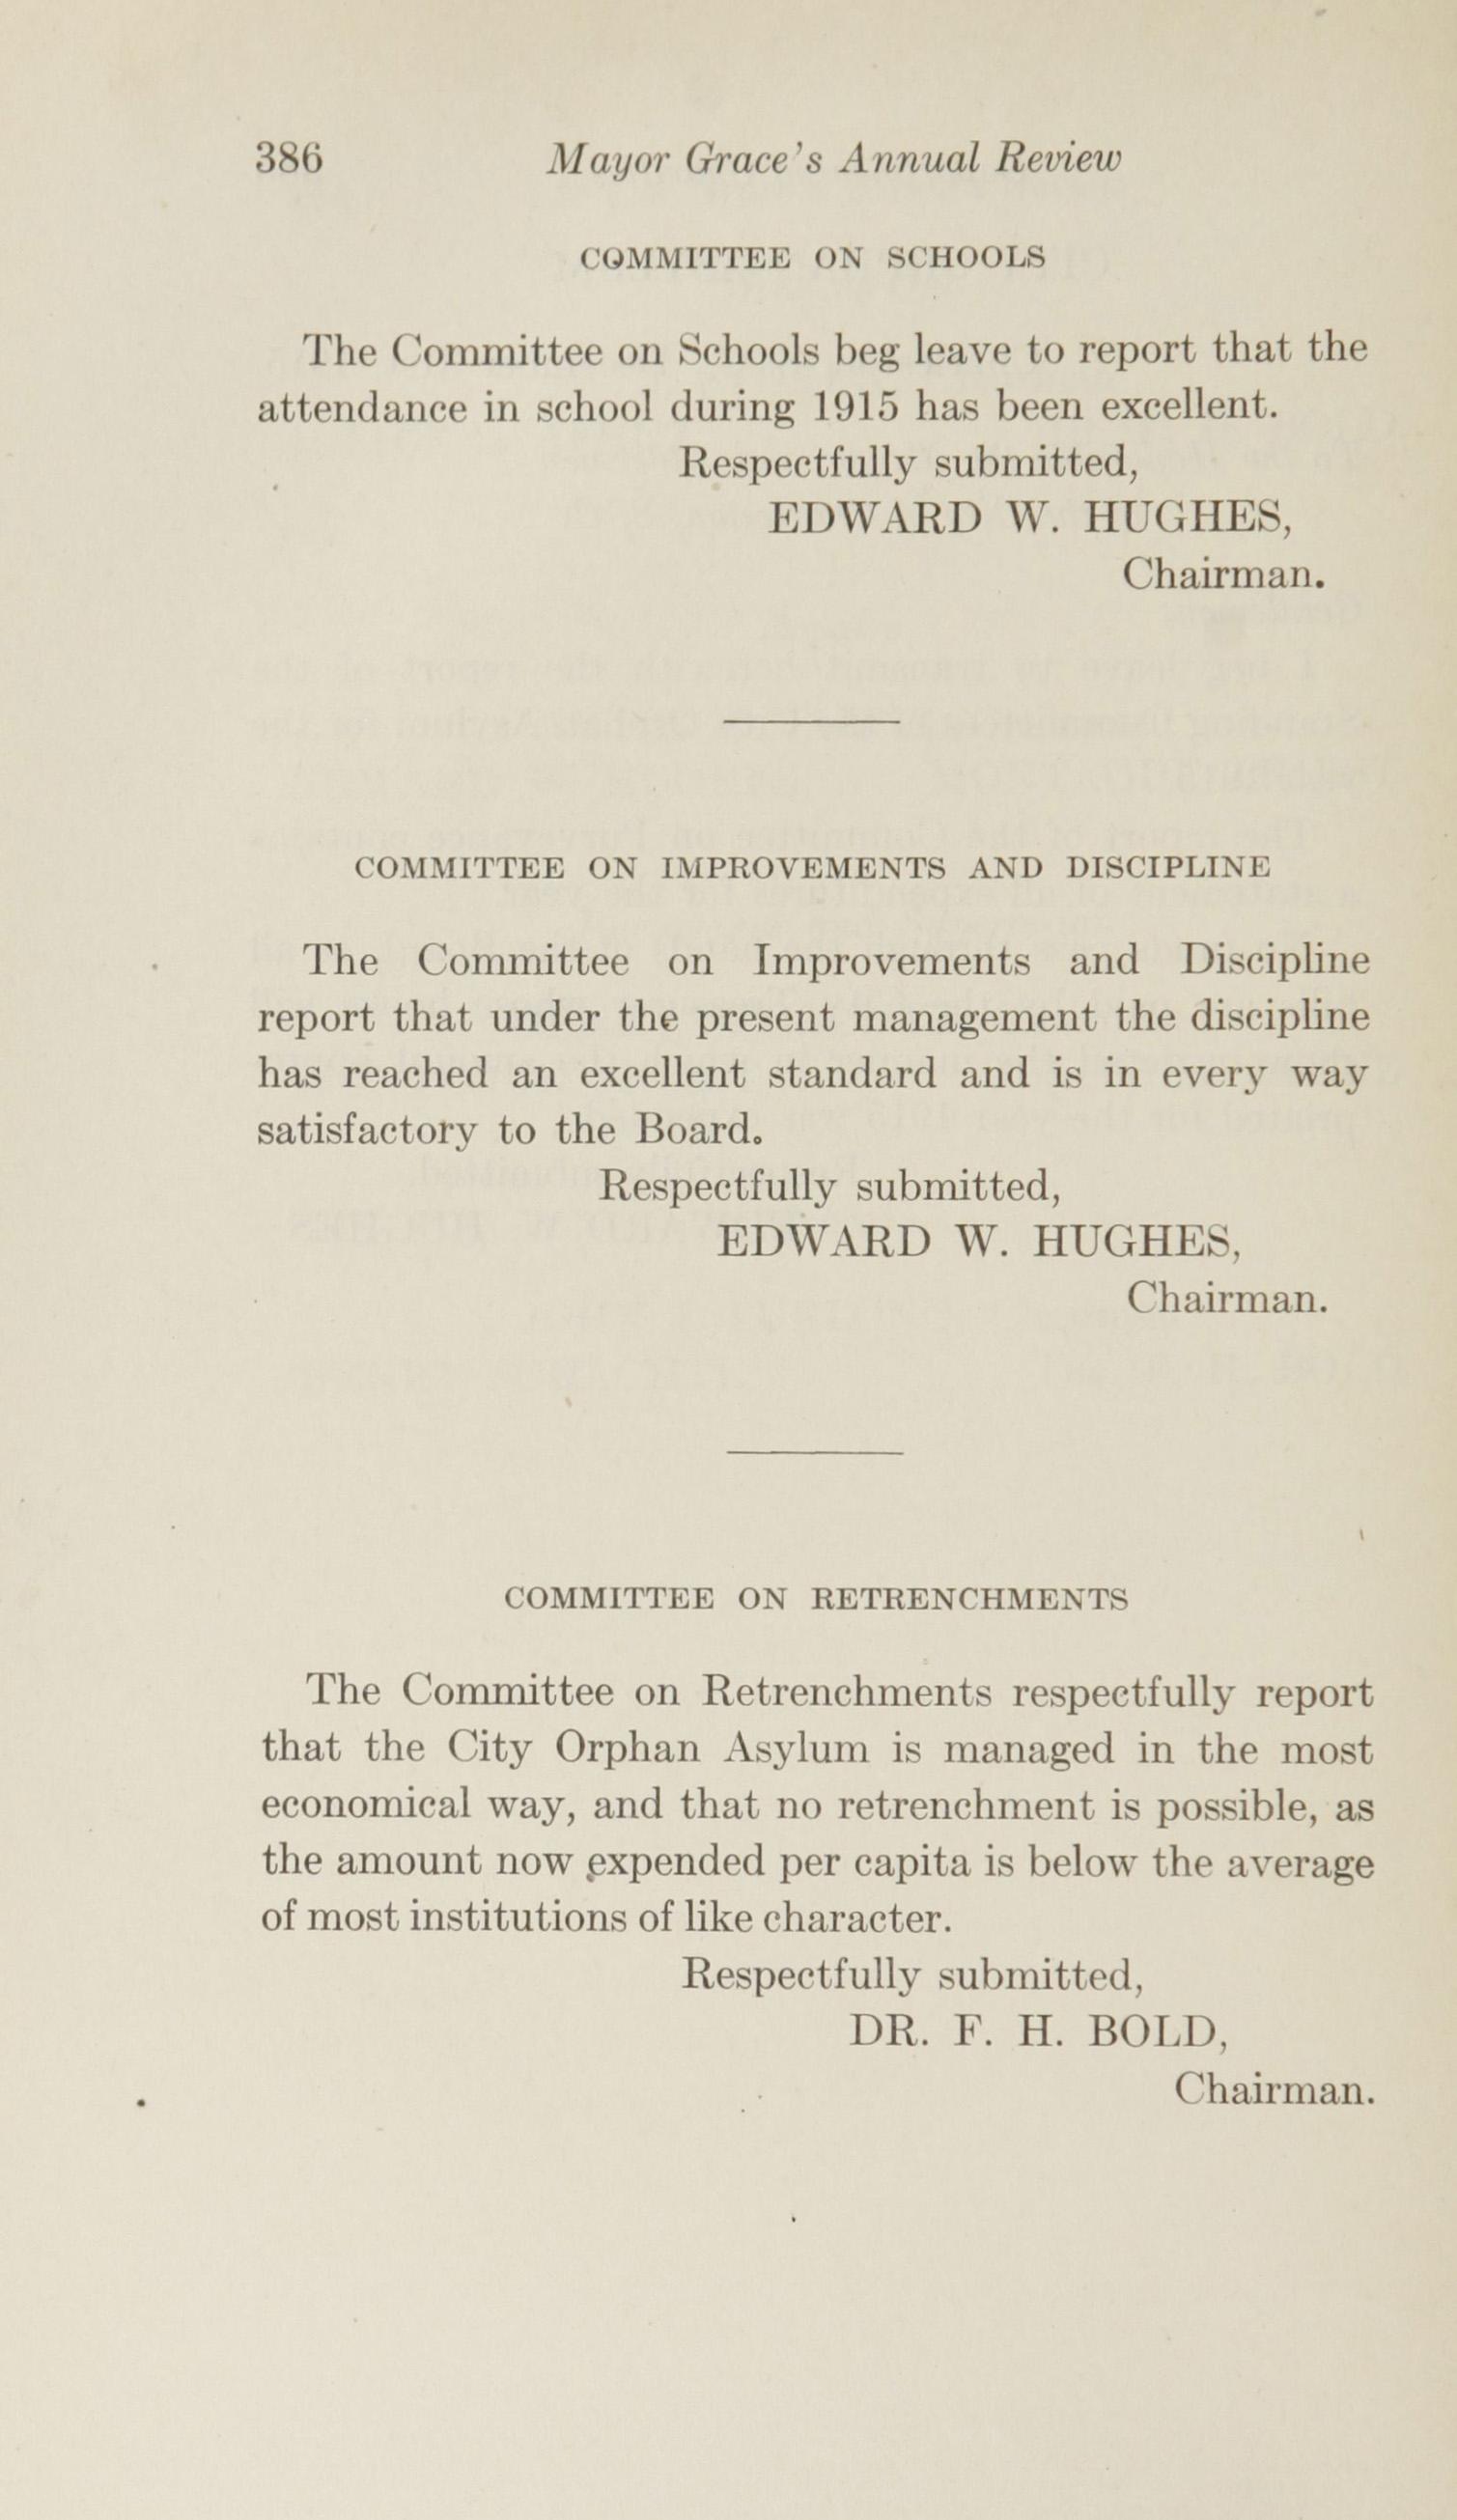 Charleston Yearbook, 1915, page 386